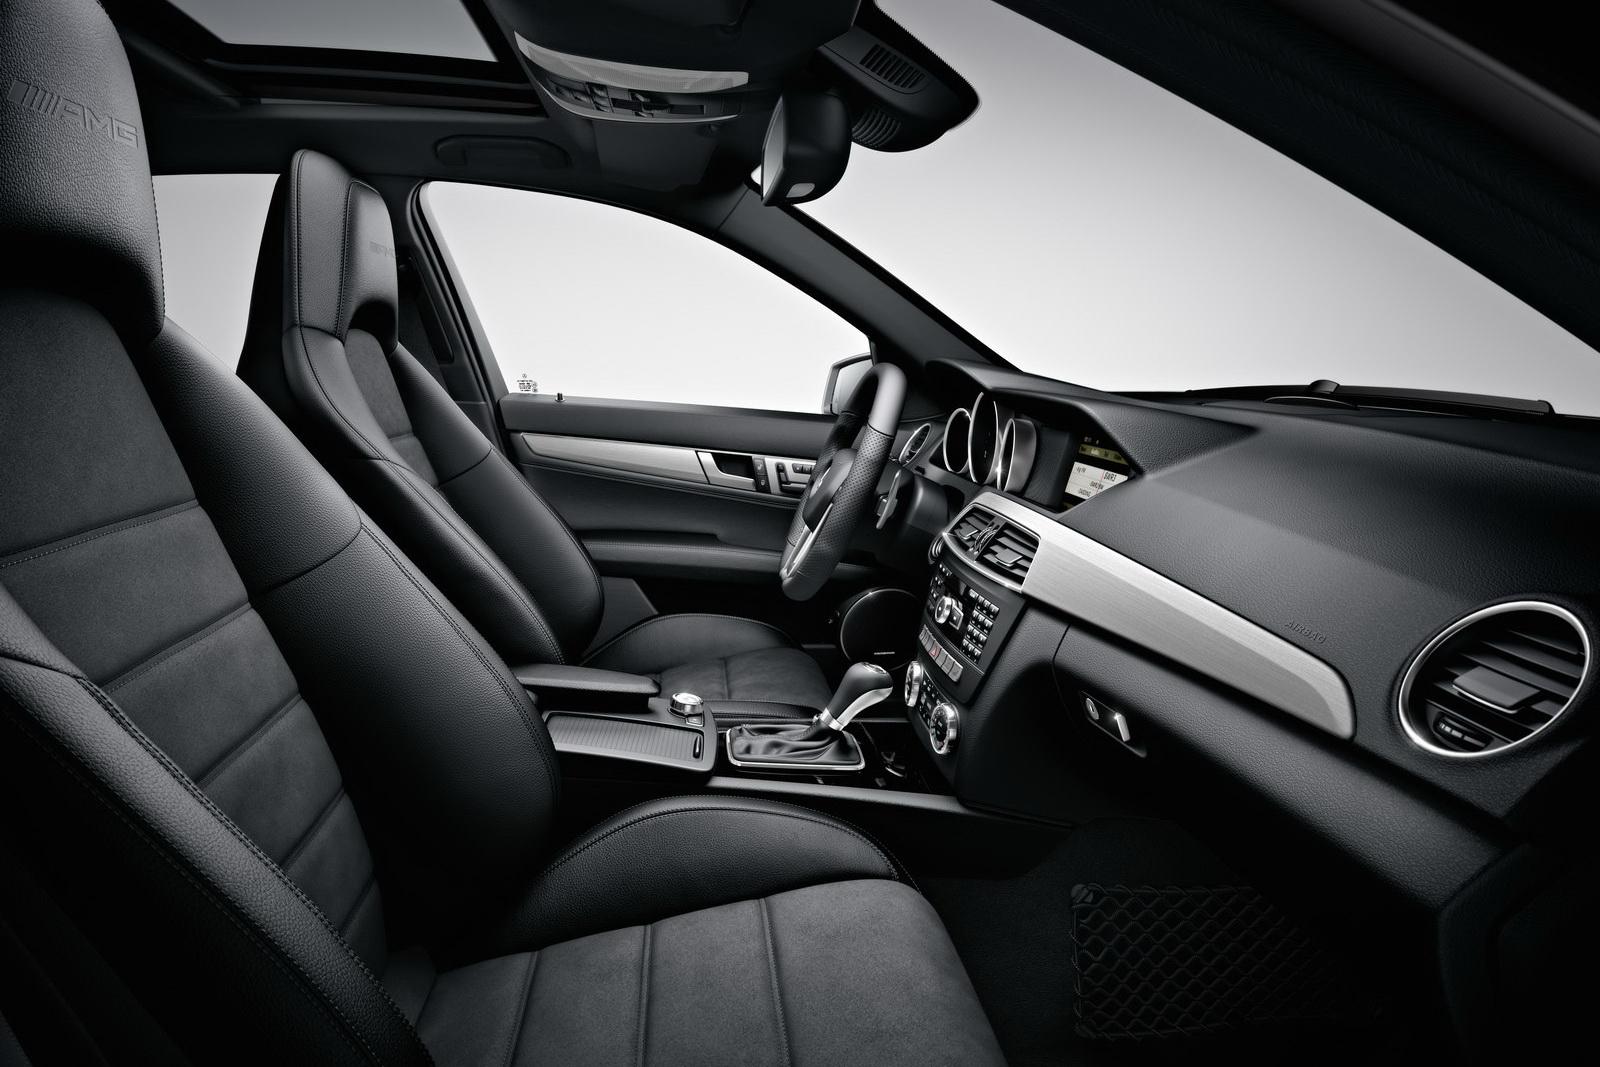 http://3.bp.blogspot.com/-JARZDAZZYnM/T9Y6k53PUeI/AAAAAAAAPP8/A-yOktv4YzA/s1600/2012-Mercedes-C63-AMG-12.jpg